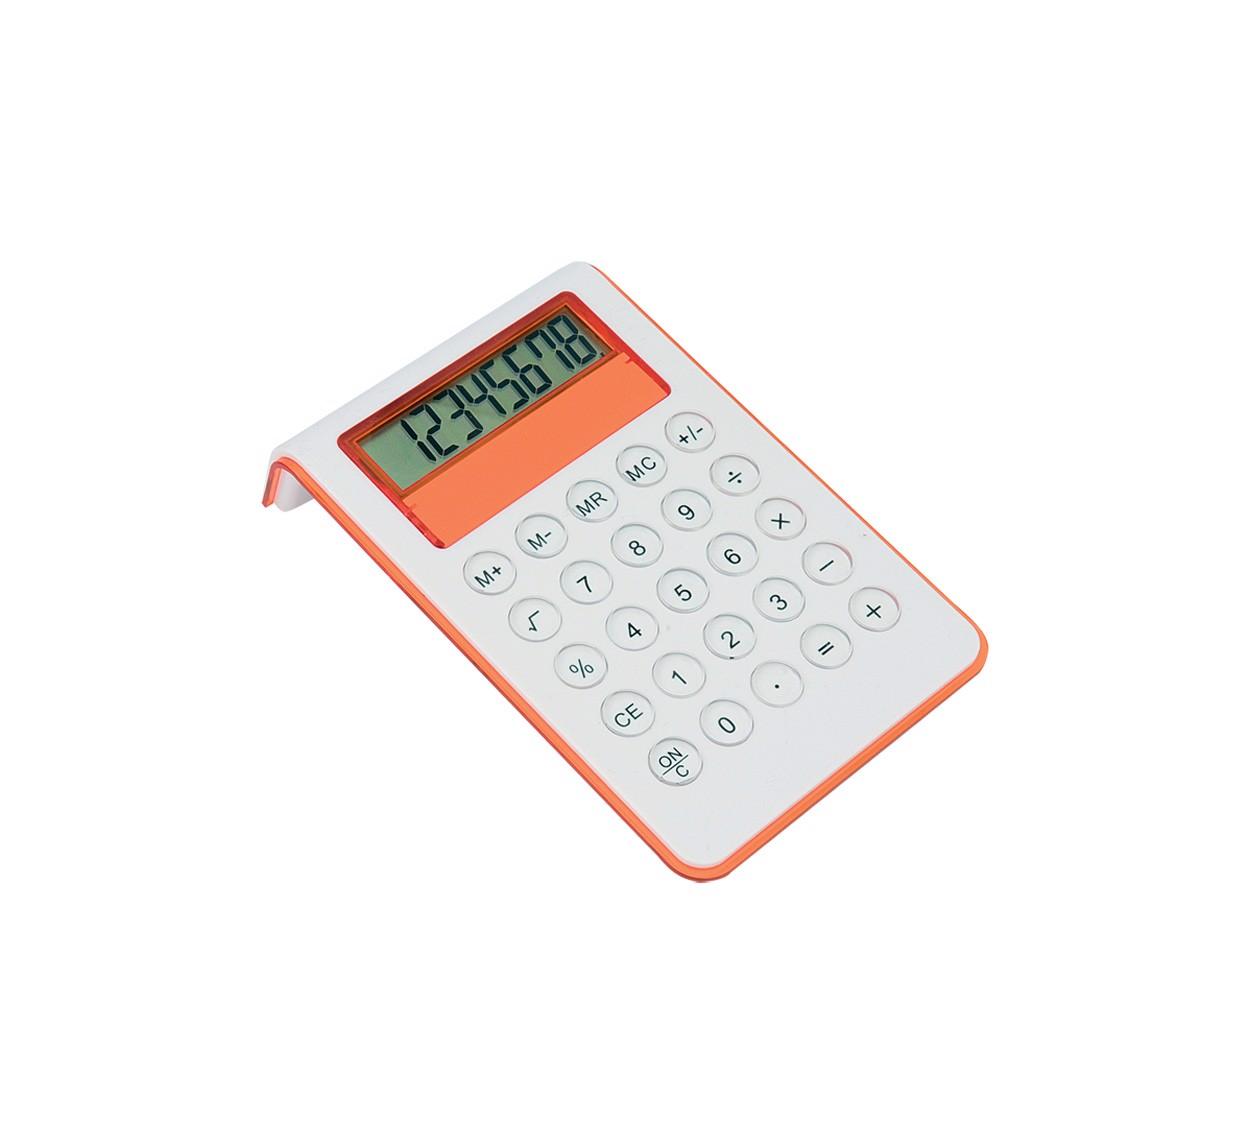 Kalkulačka Myd - Oranžová / Bílá